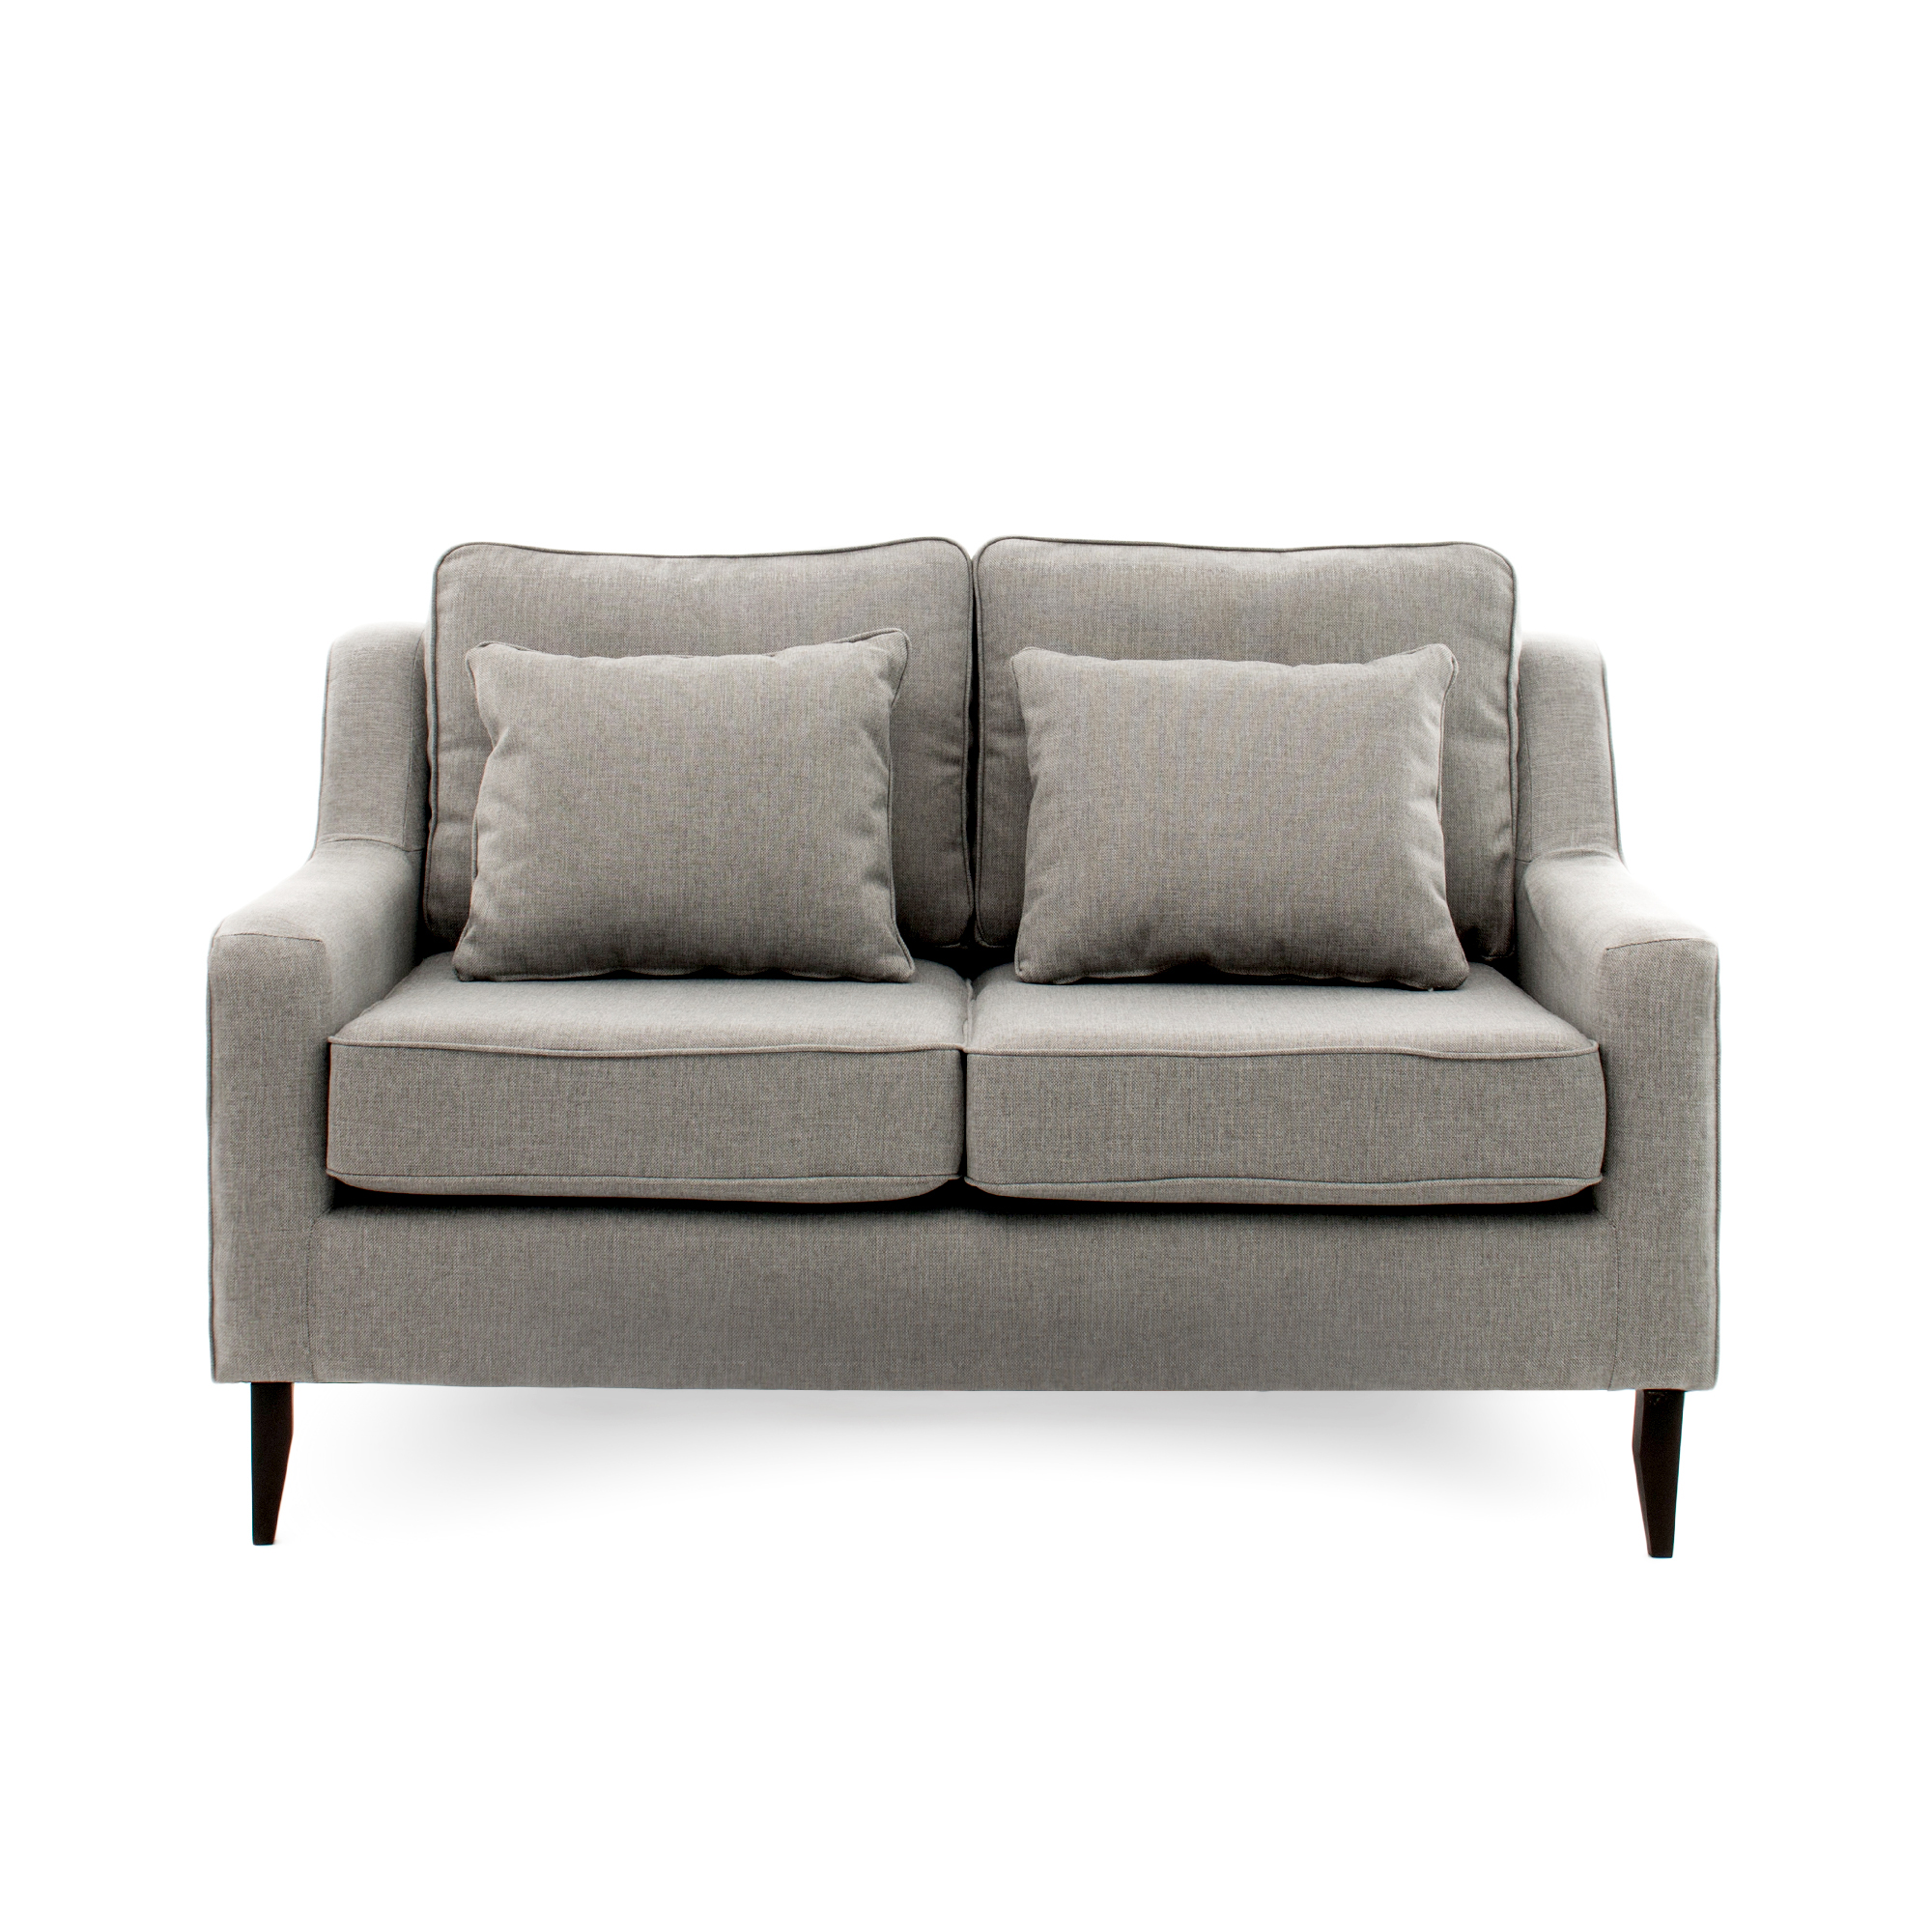 Canapea Fixa 2 Locuri Bond Grey